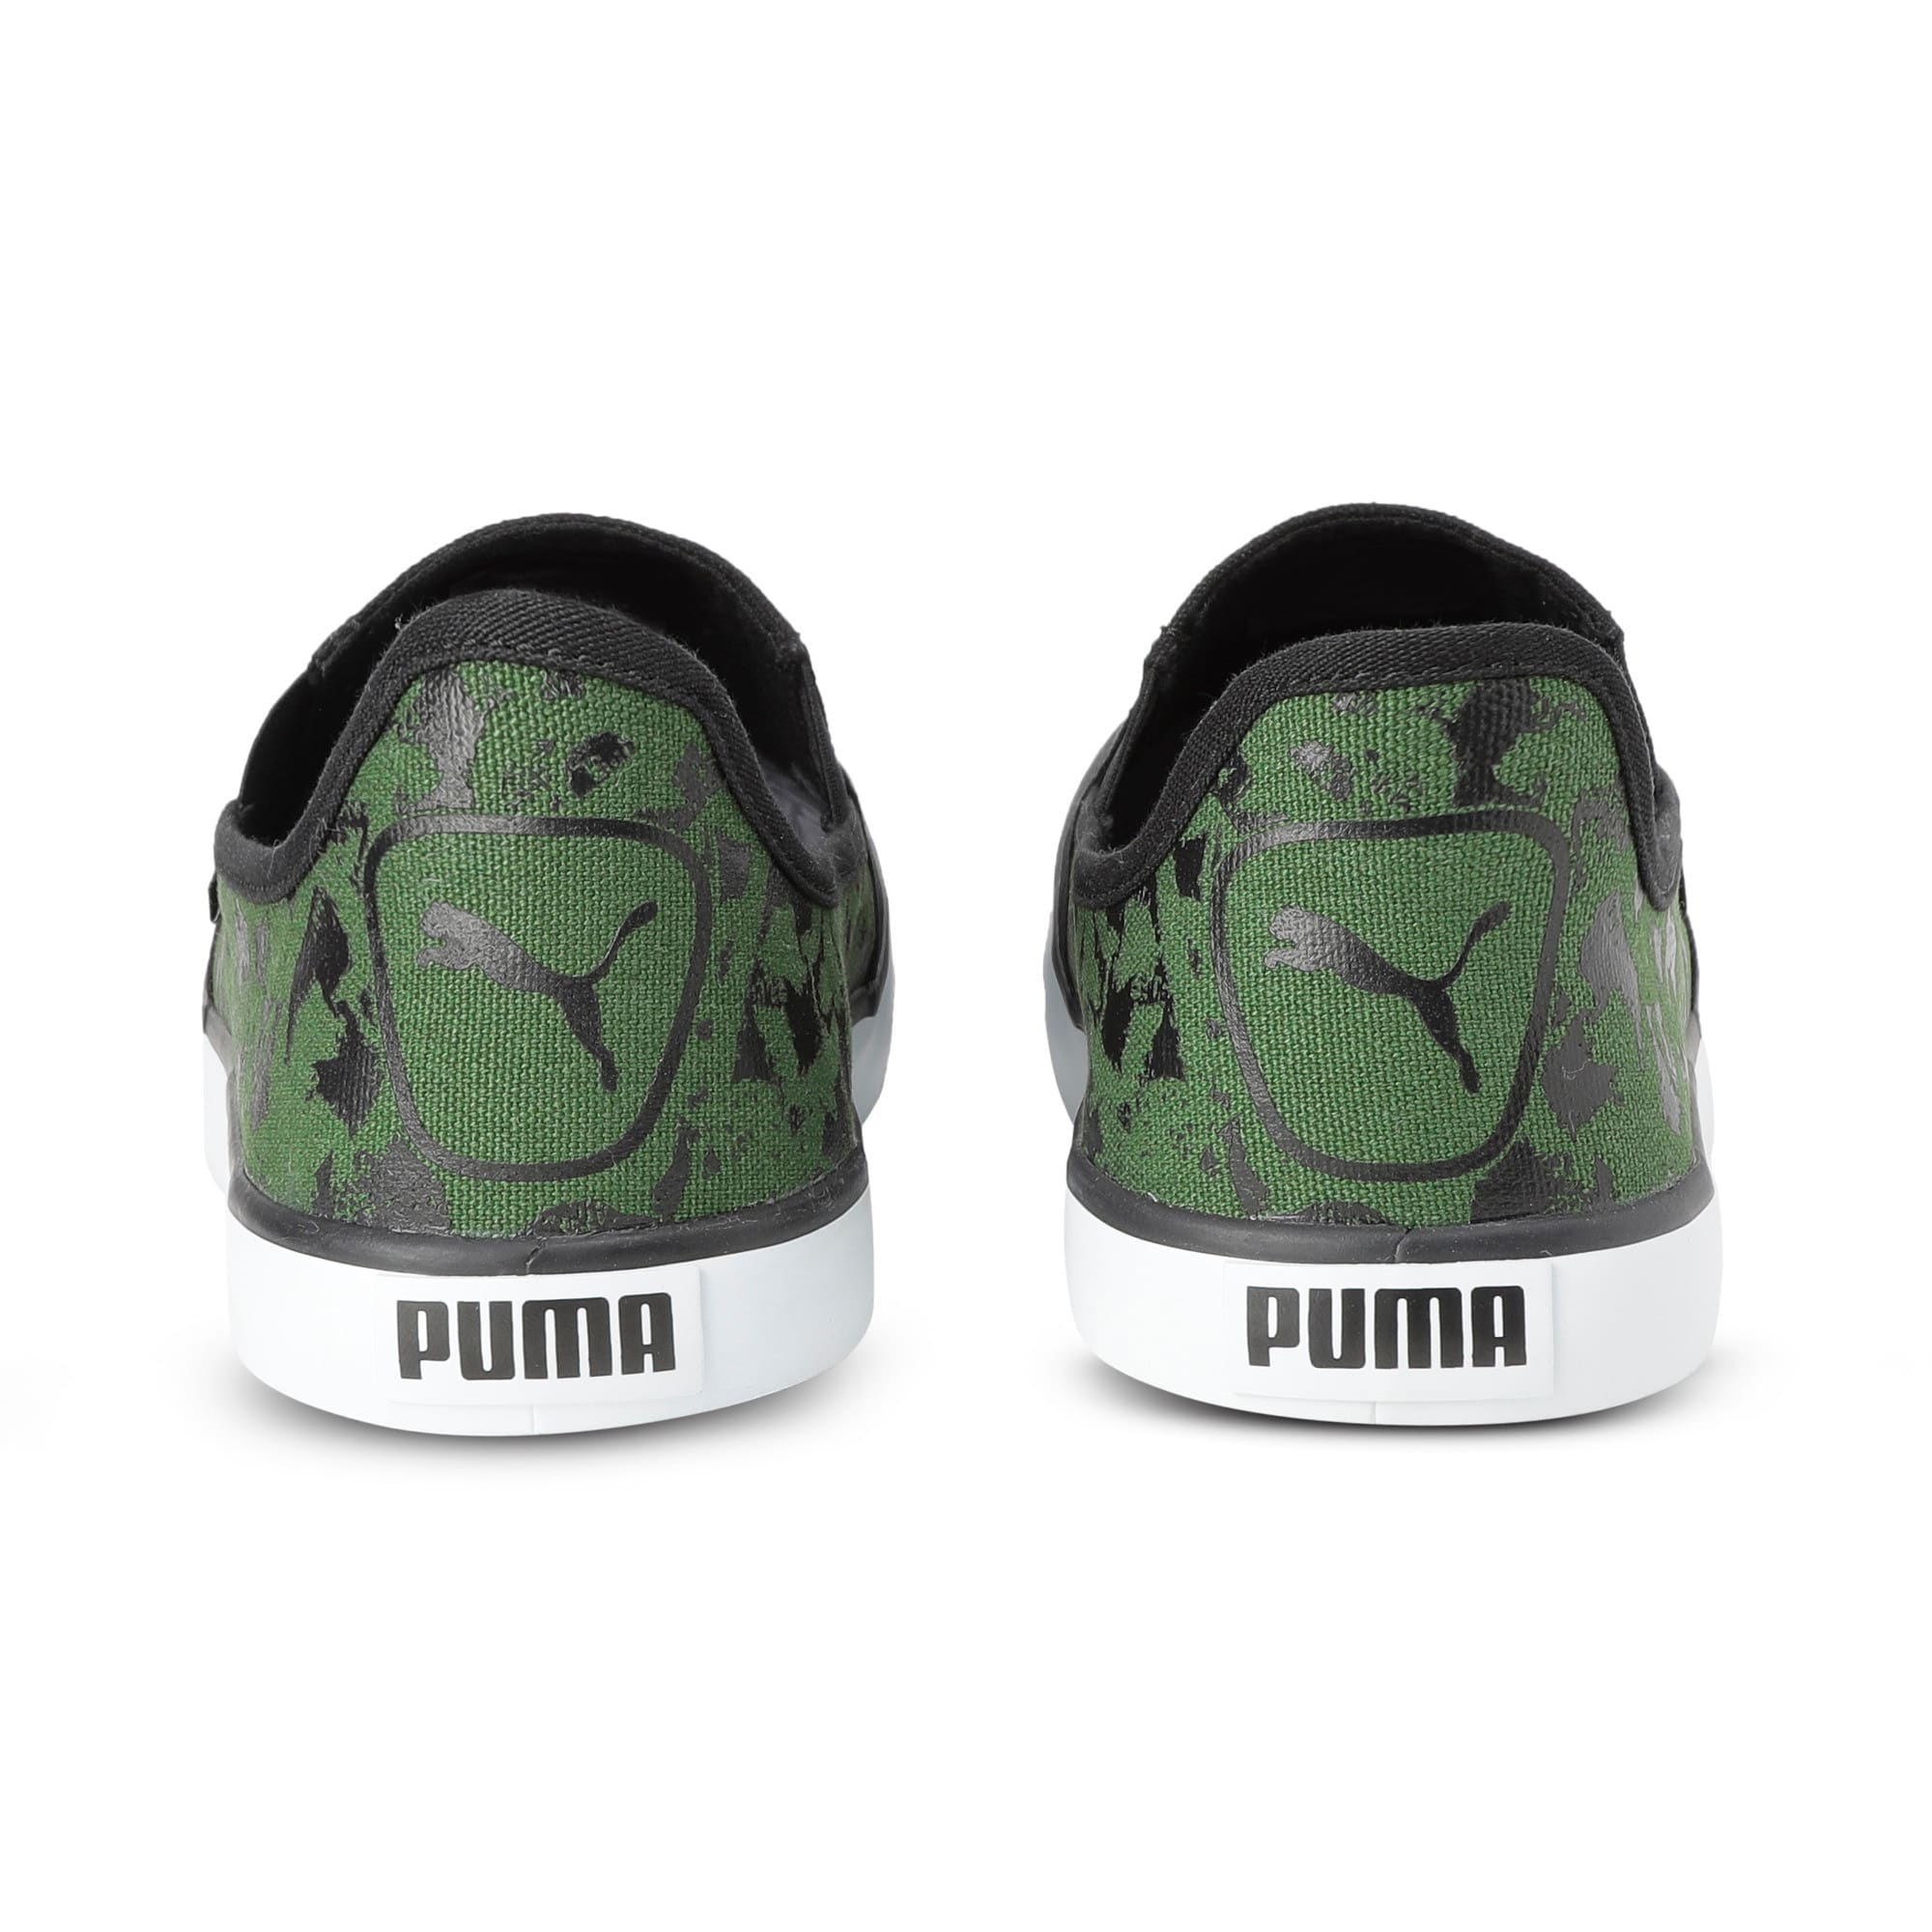 Thumbnail 3 of Auxius V2 IDP, Puma Black-Garden Green, medium-IND